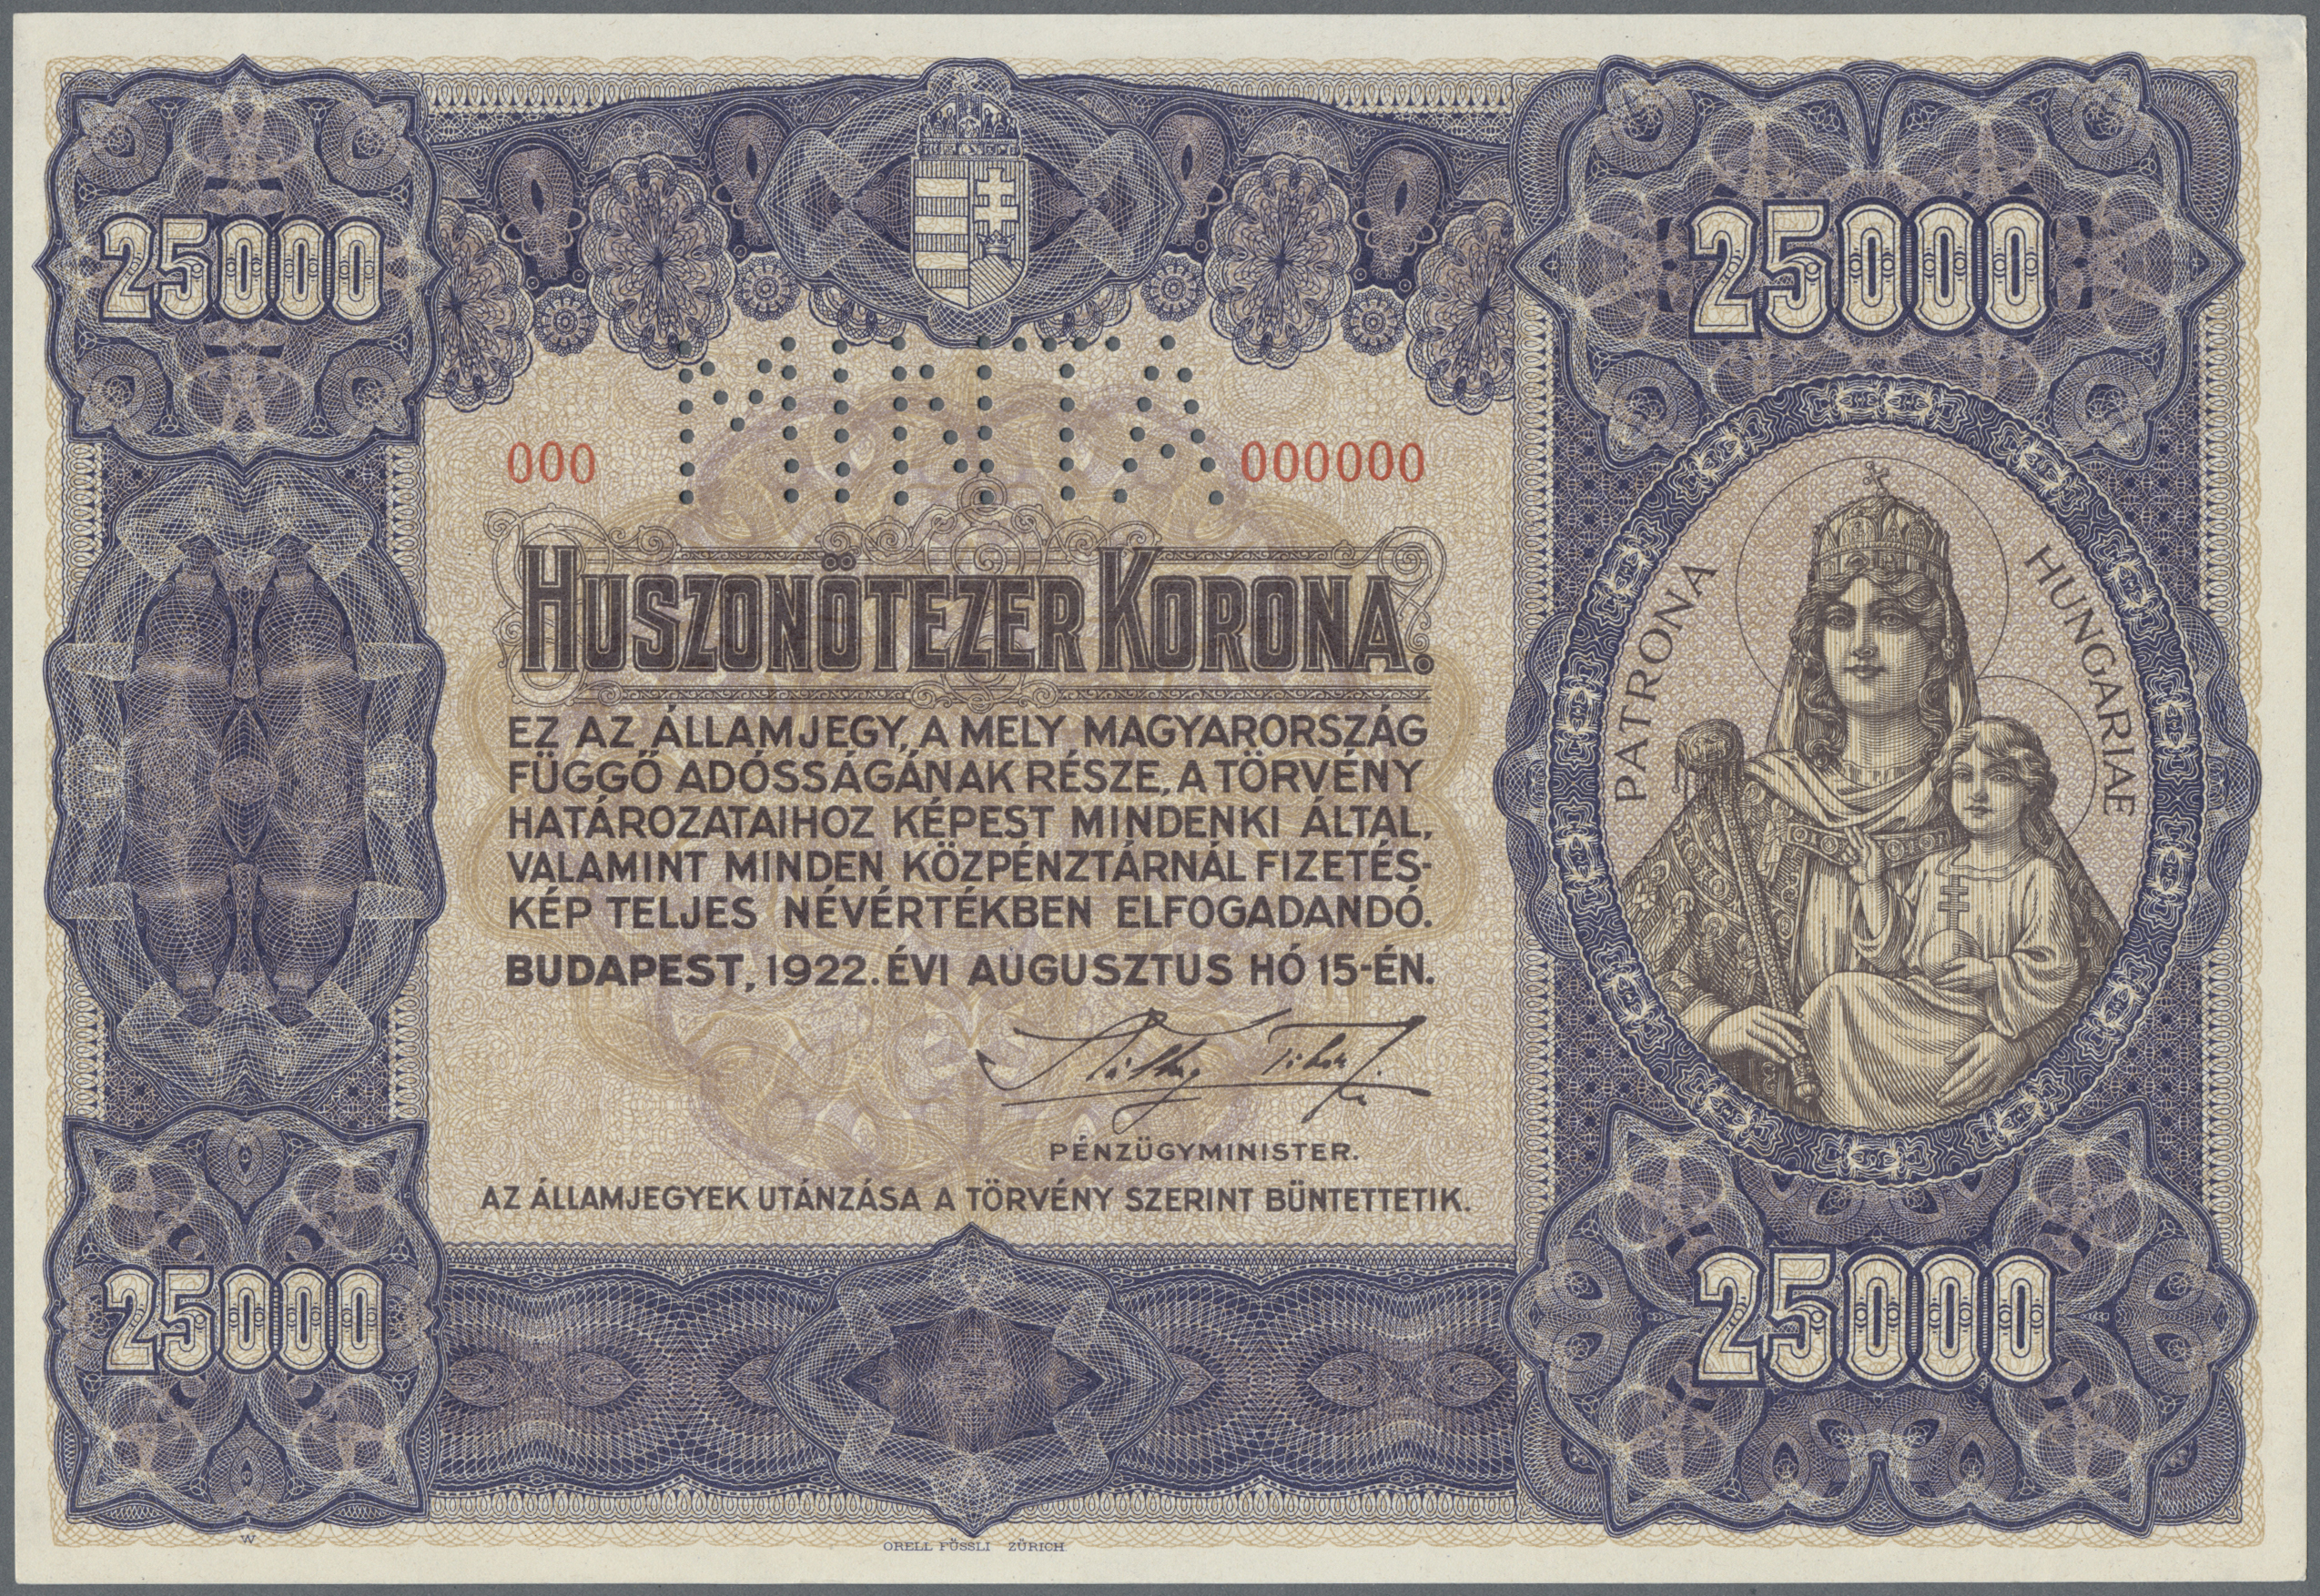 Lot 00377 - Hungary / Ungarn | Banknoten  -  Auktionshaus Christoph Gärtner GmbH & Co. KG Sale #48 The Banknotes